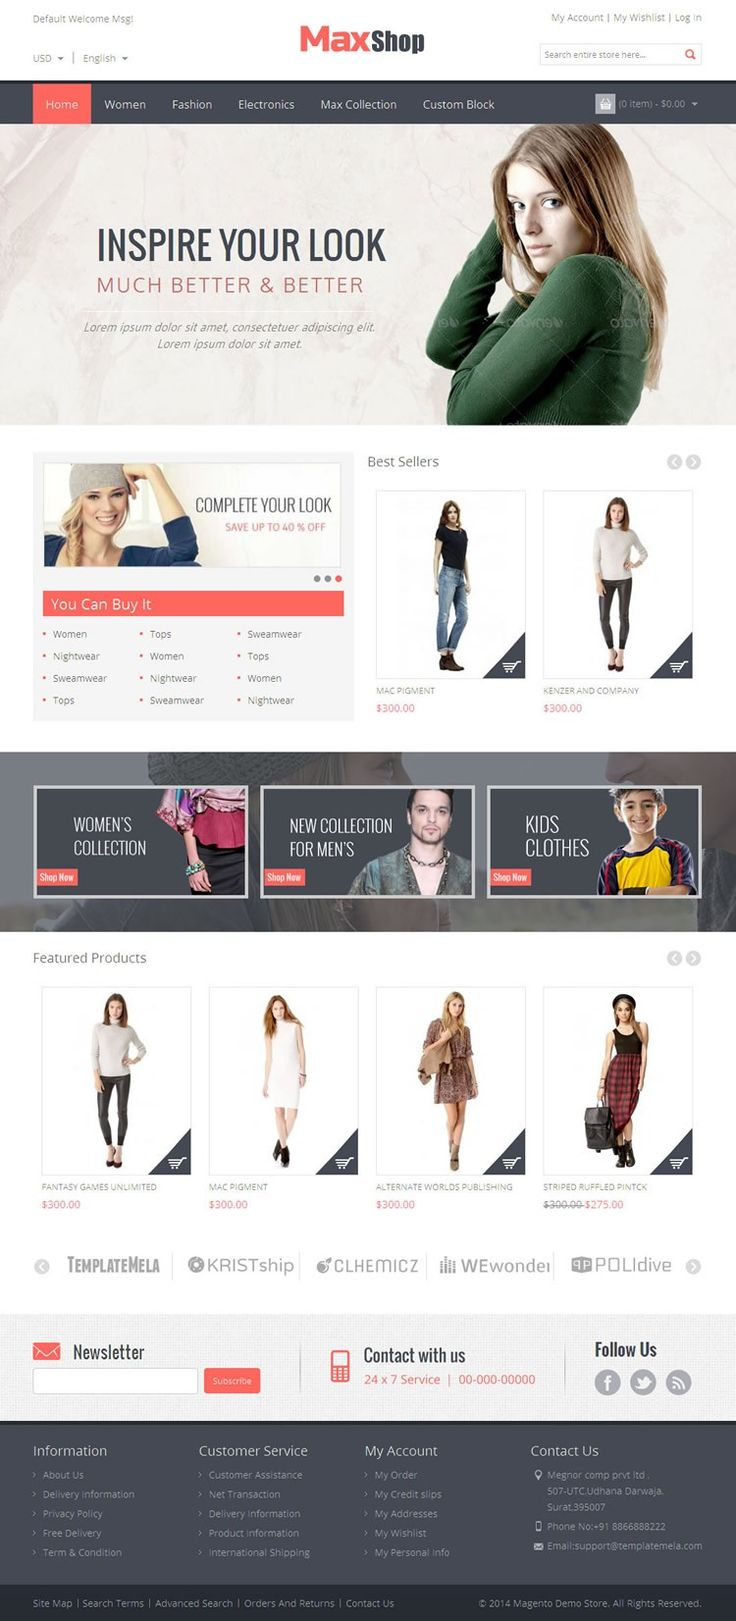 127 best images about Premium magento templates on Pinterest | It ...